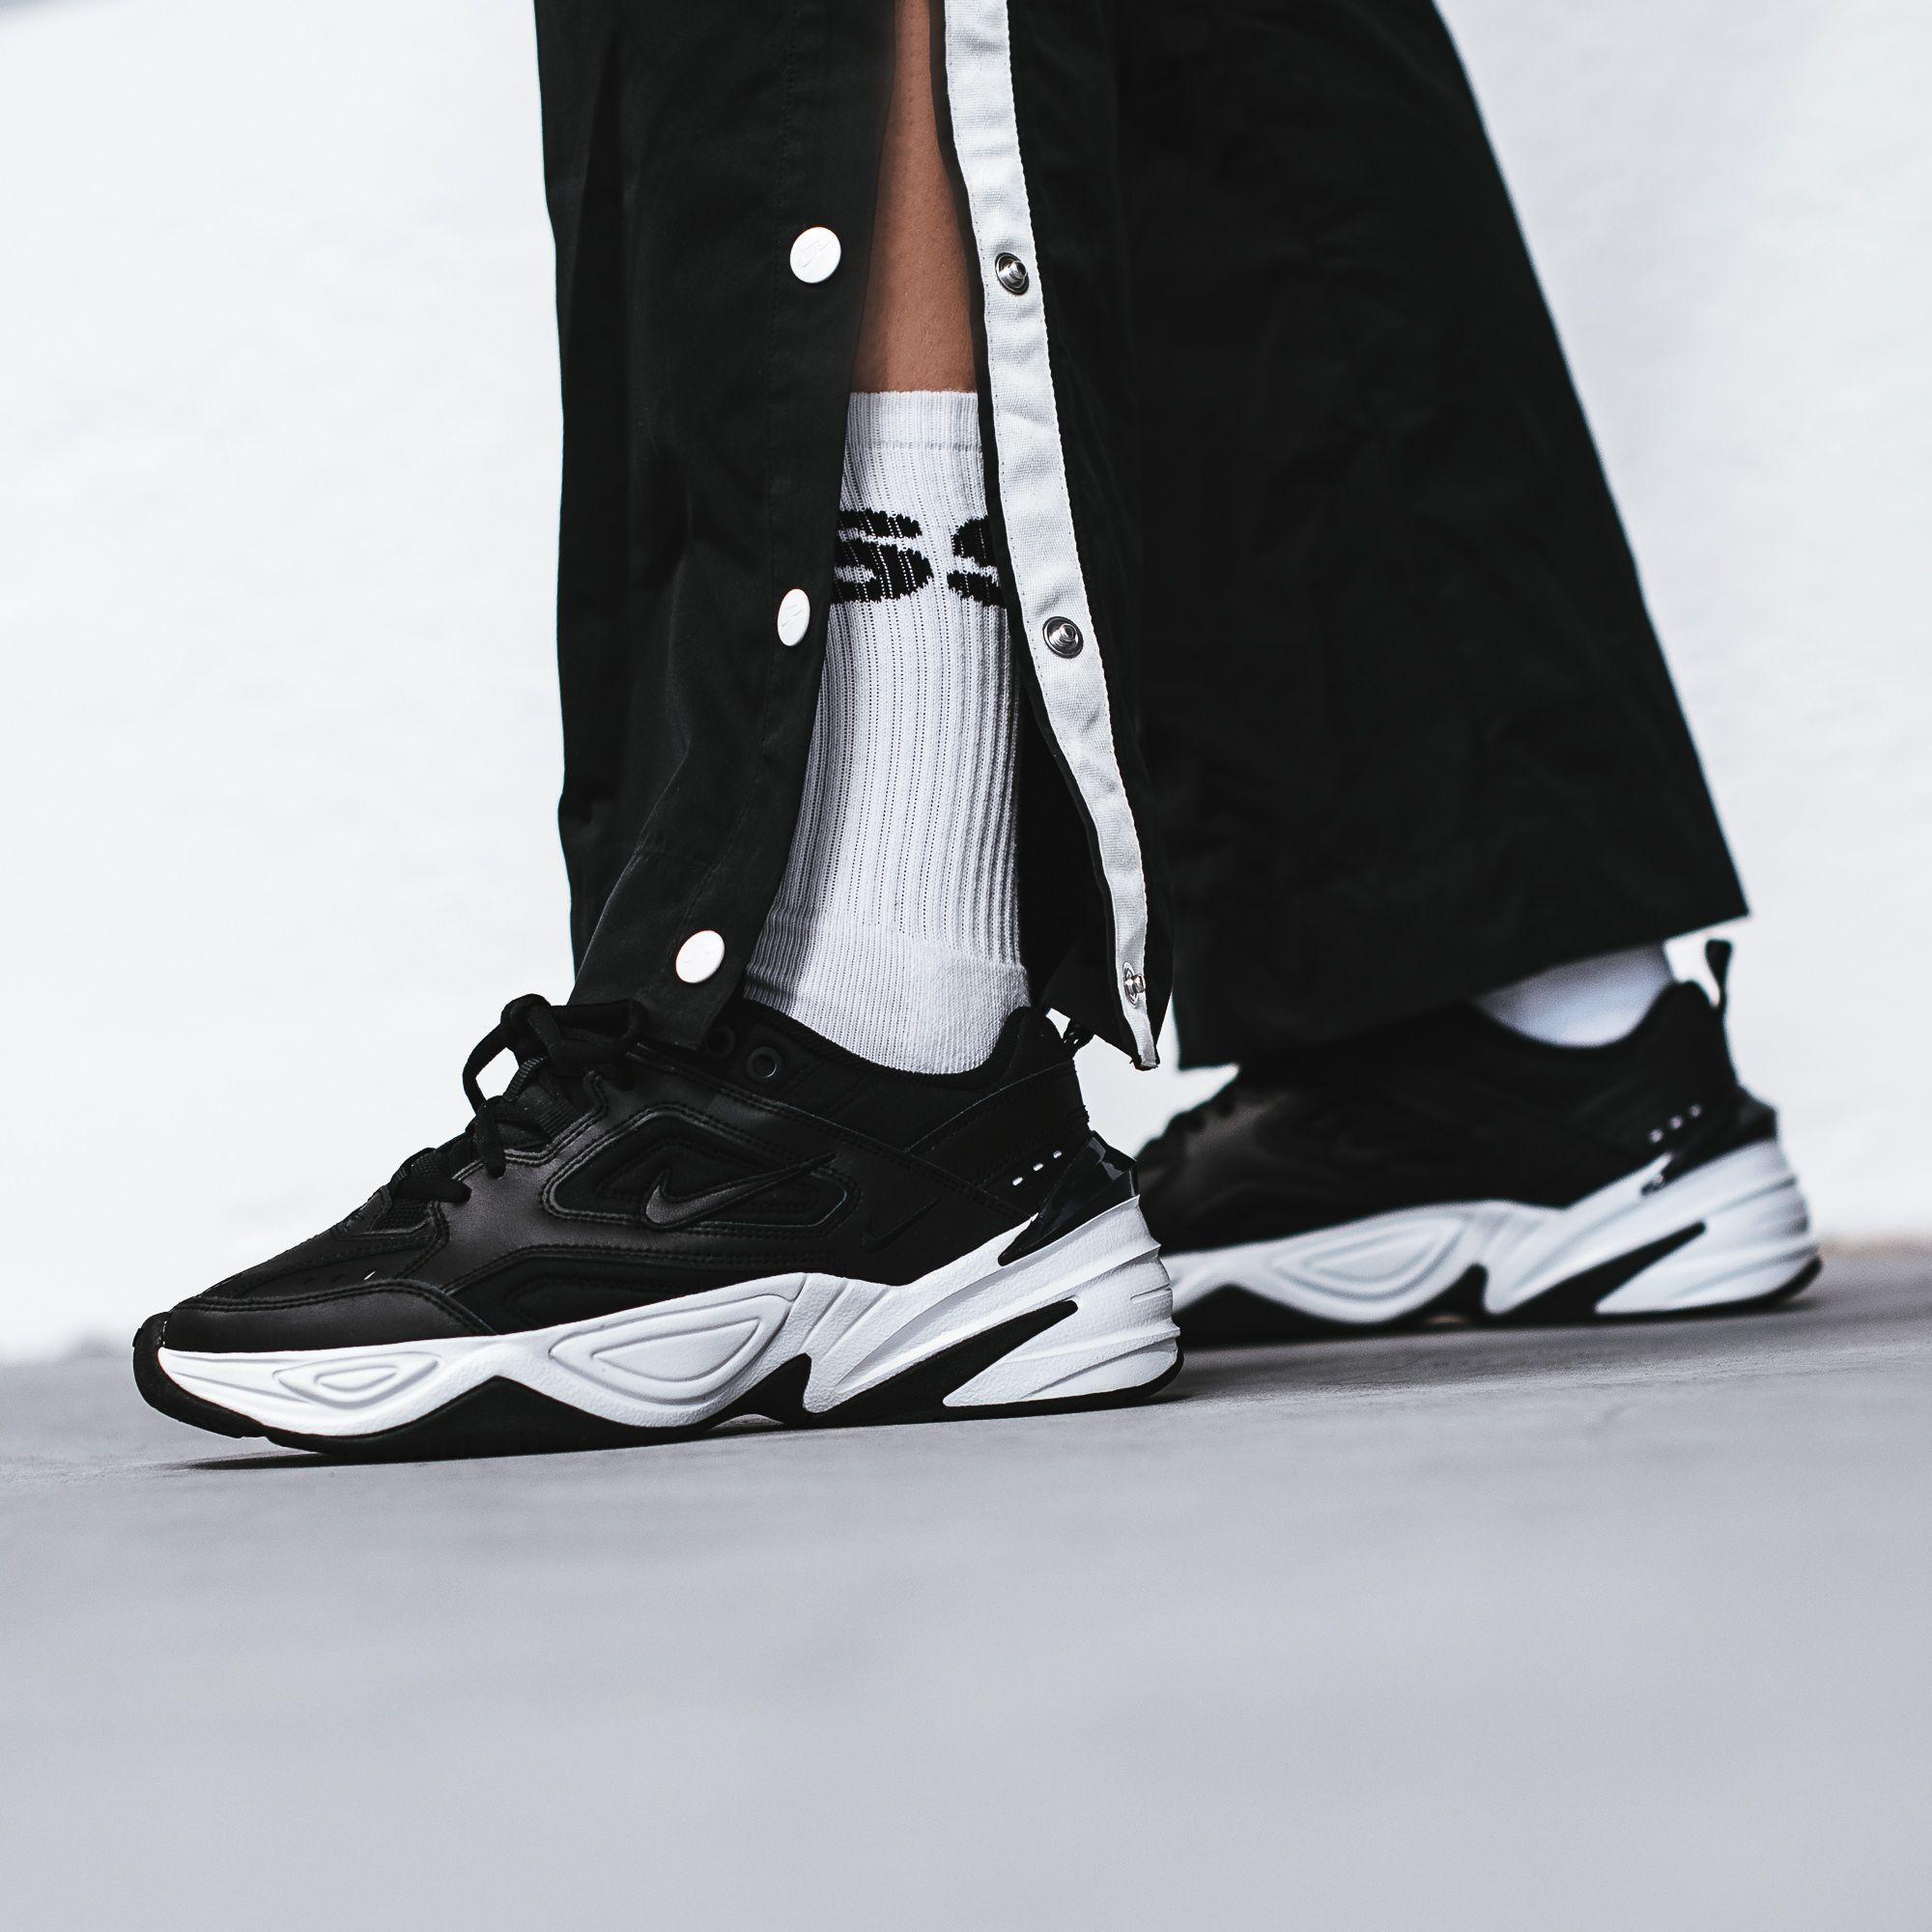 ADIDAS INIKI RUNNER W BY9094 | Rosa | 69,99 € | Sneaker | ✪ ✪